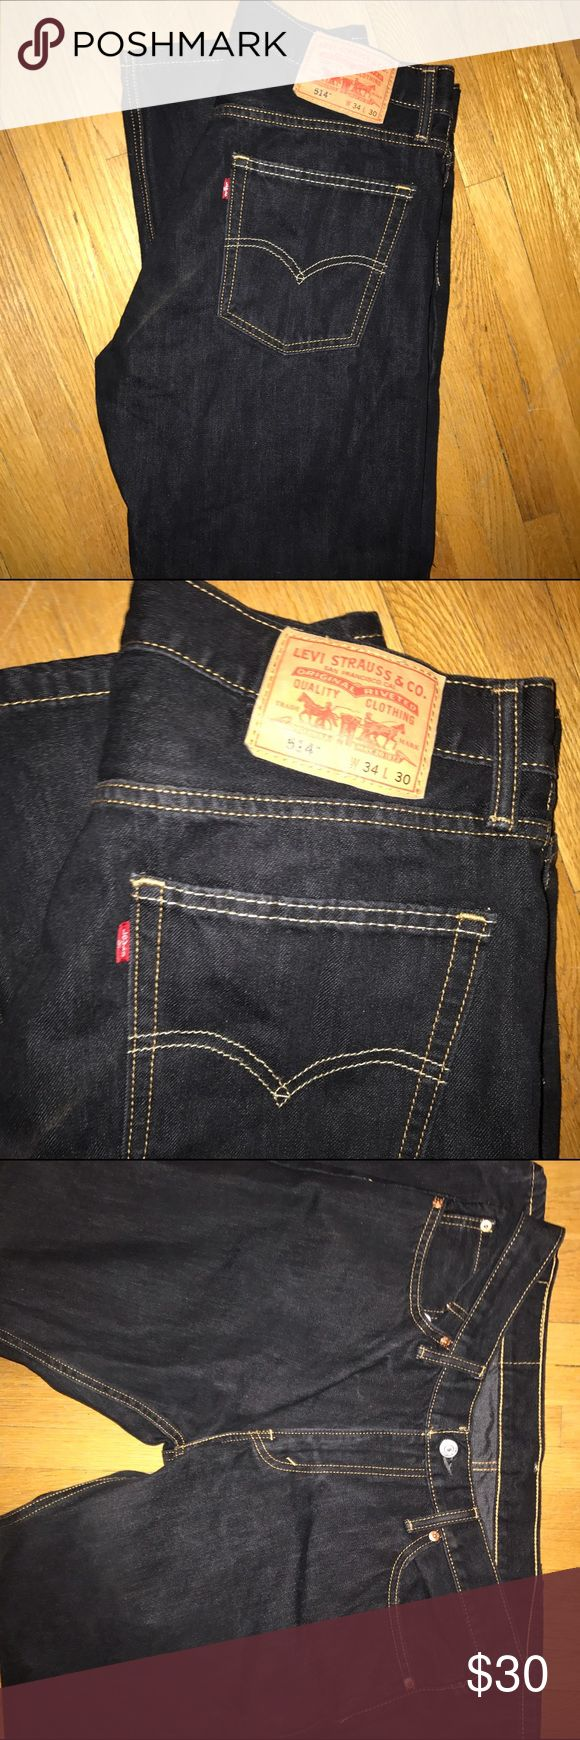 Men's Levi 514 Dark Wash Jeans Men's Levi Strauss Jeans size 34/30 Levi's Jeans Straight